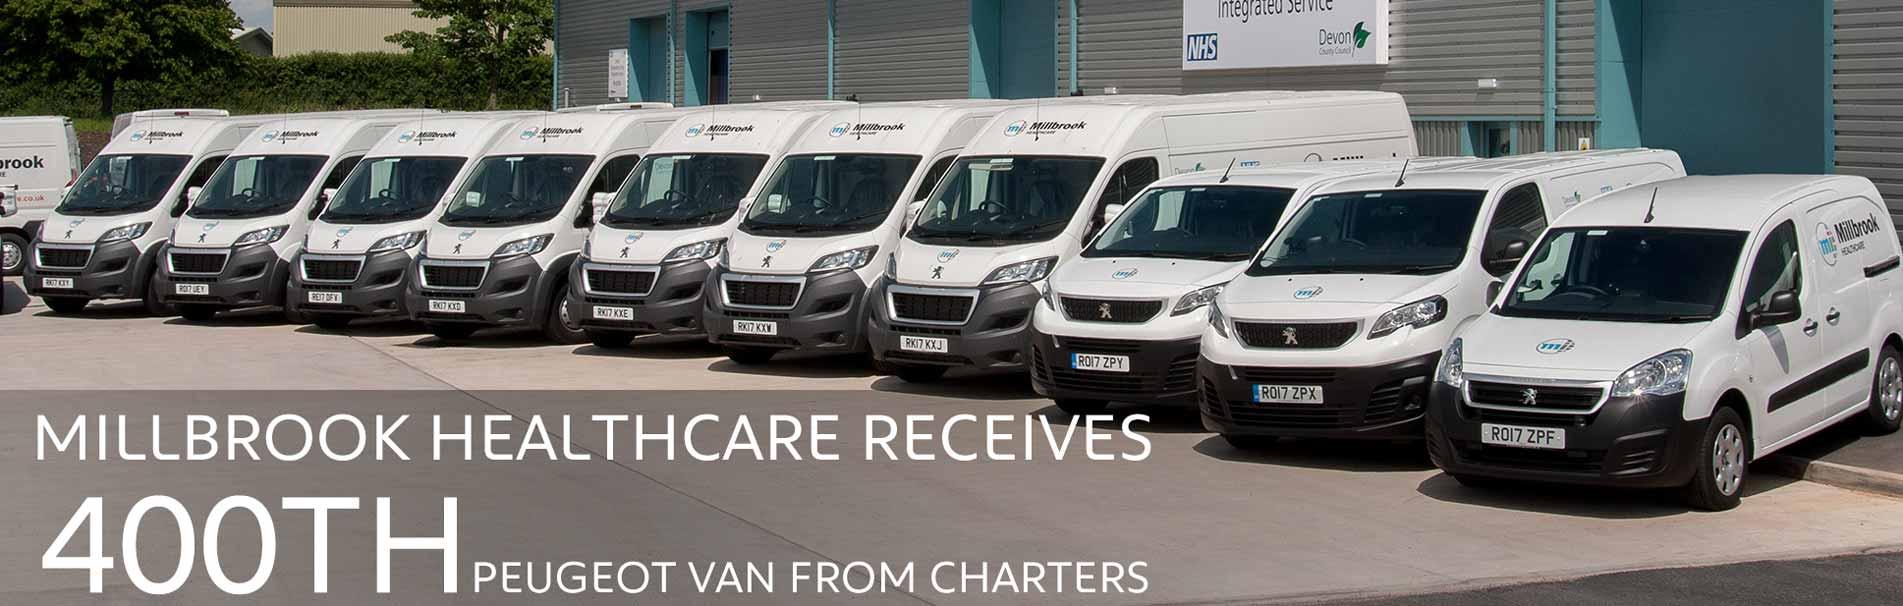 millbrook-receives-400th-peugeot-van-from-charters-peugeot-aldershot-sli